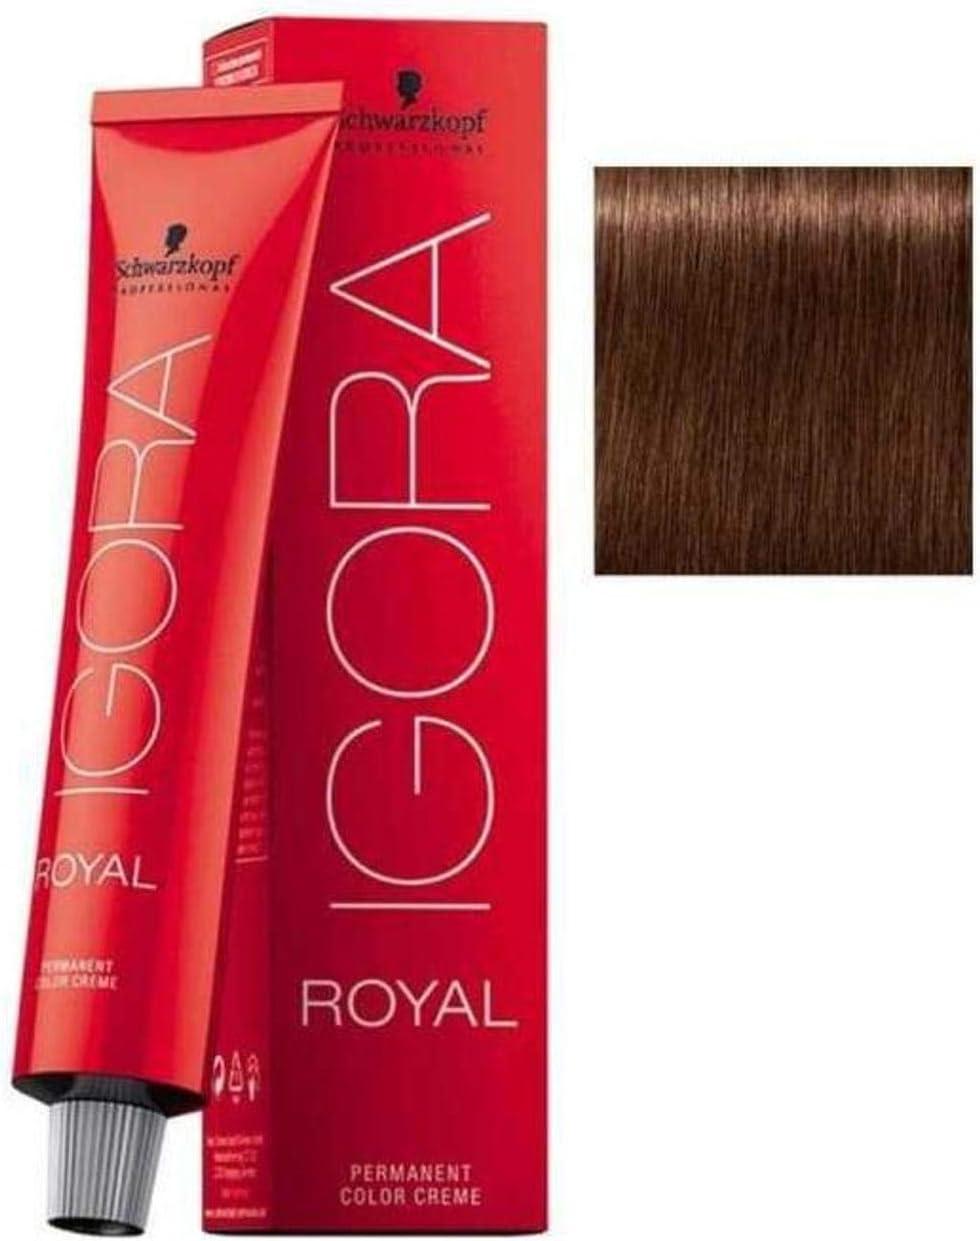 Schwarzkopf Igora Royal Permanent Hair Color - 6-68 Dark Auburn Blonde - 60 ML by Schwarzkopf Igora